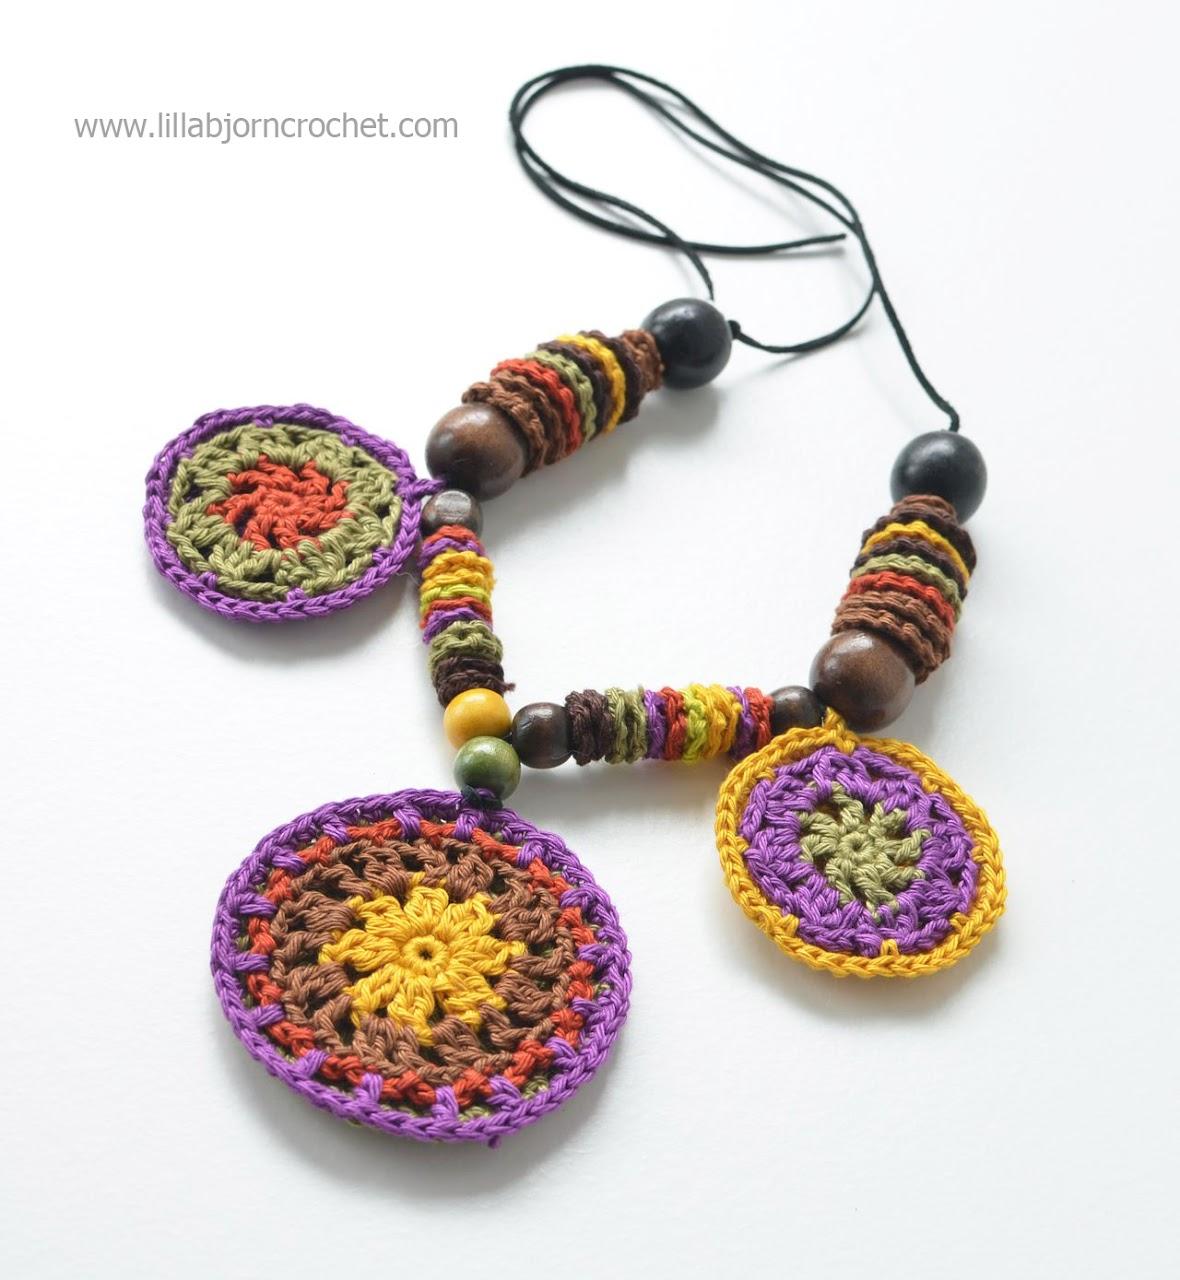 Crochet mandala necklace - by Lilla Bjorn Crochet